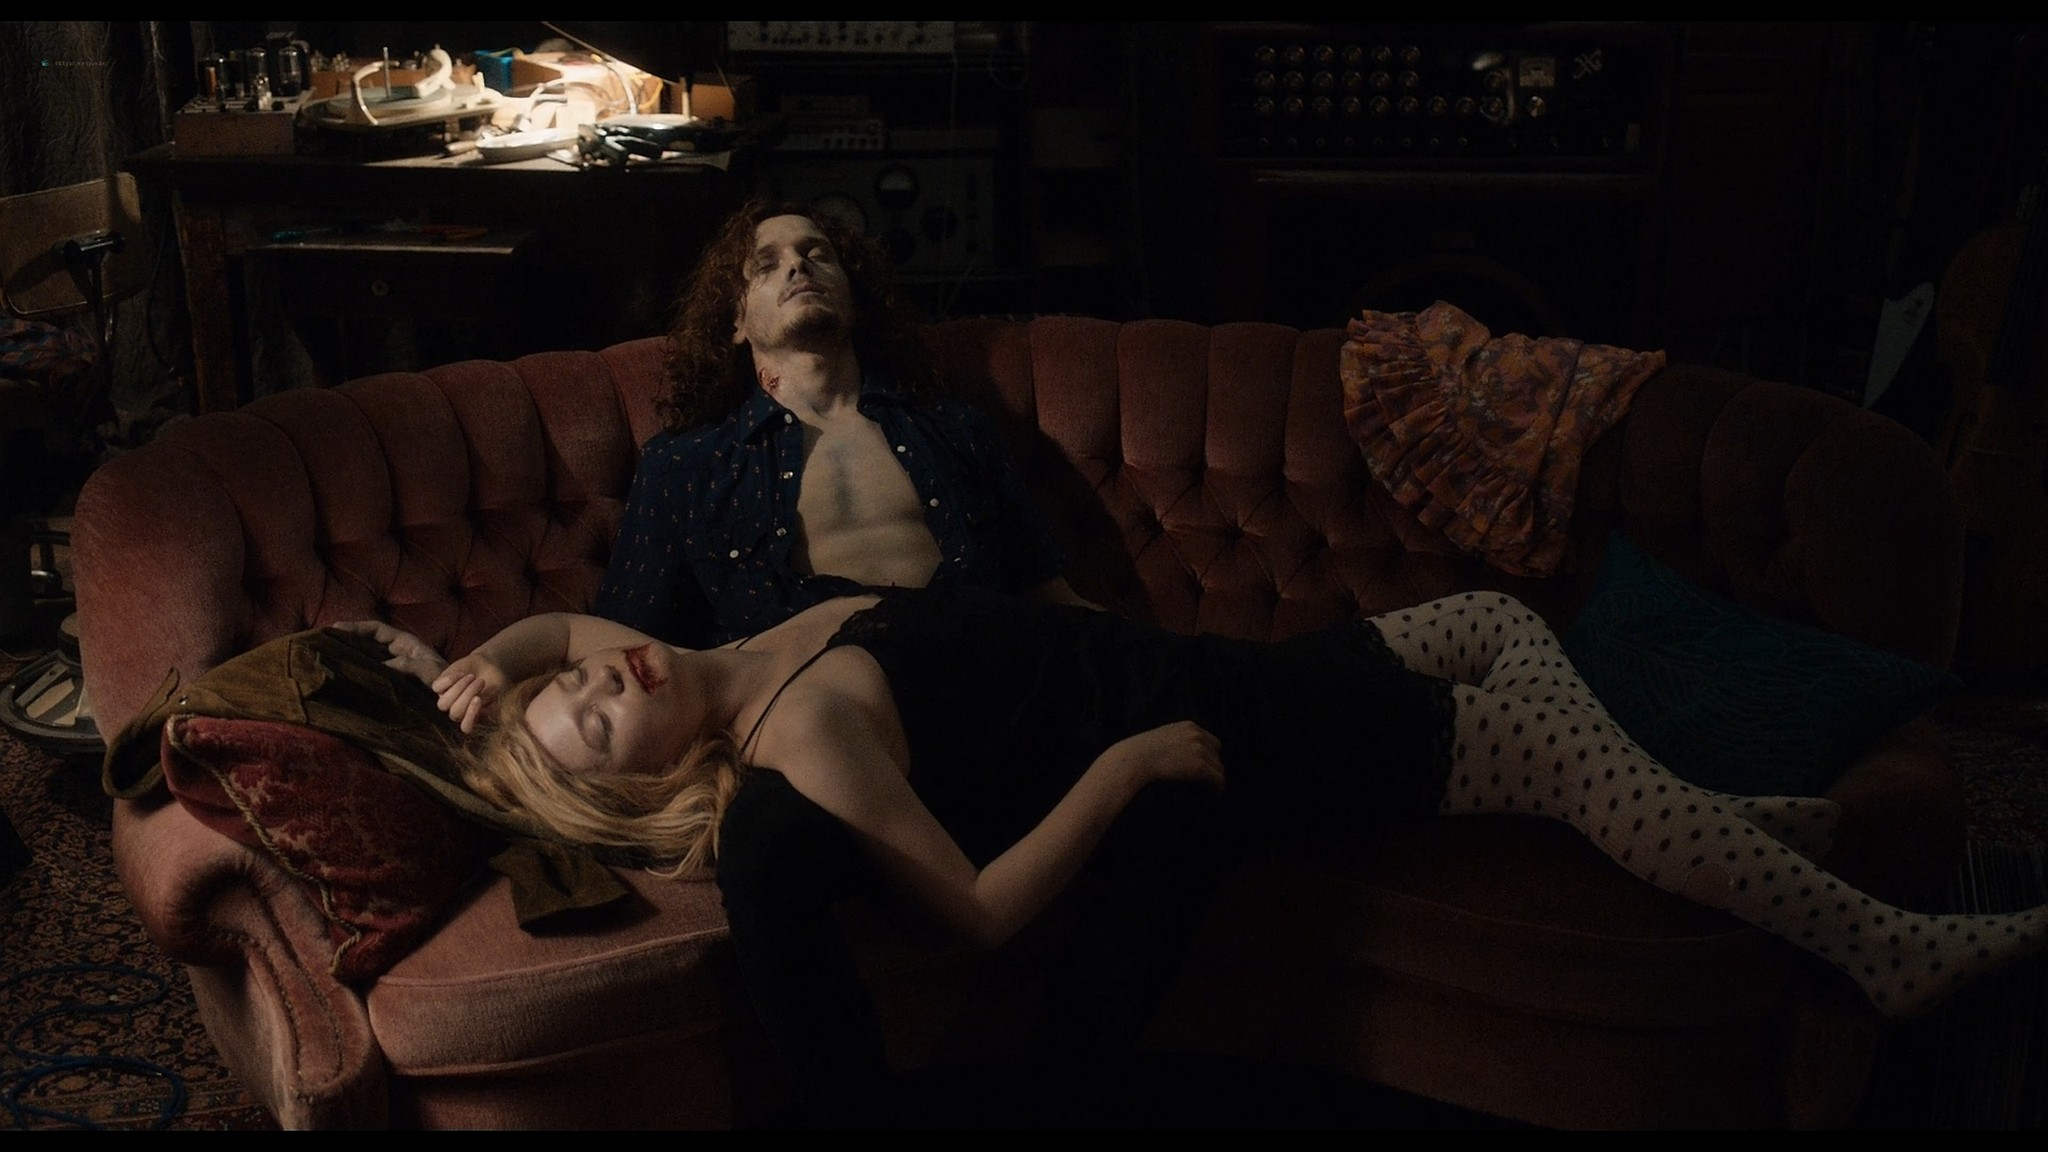 Tilda Swinton nude Mia Wasikowska sexy Only Lovers Left Alive 2013 HD 1080p BluRay 11